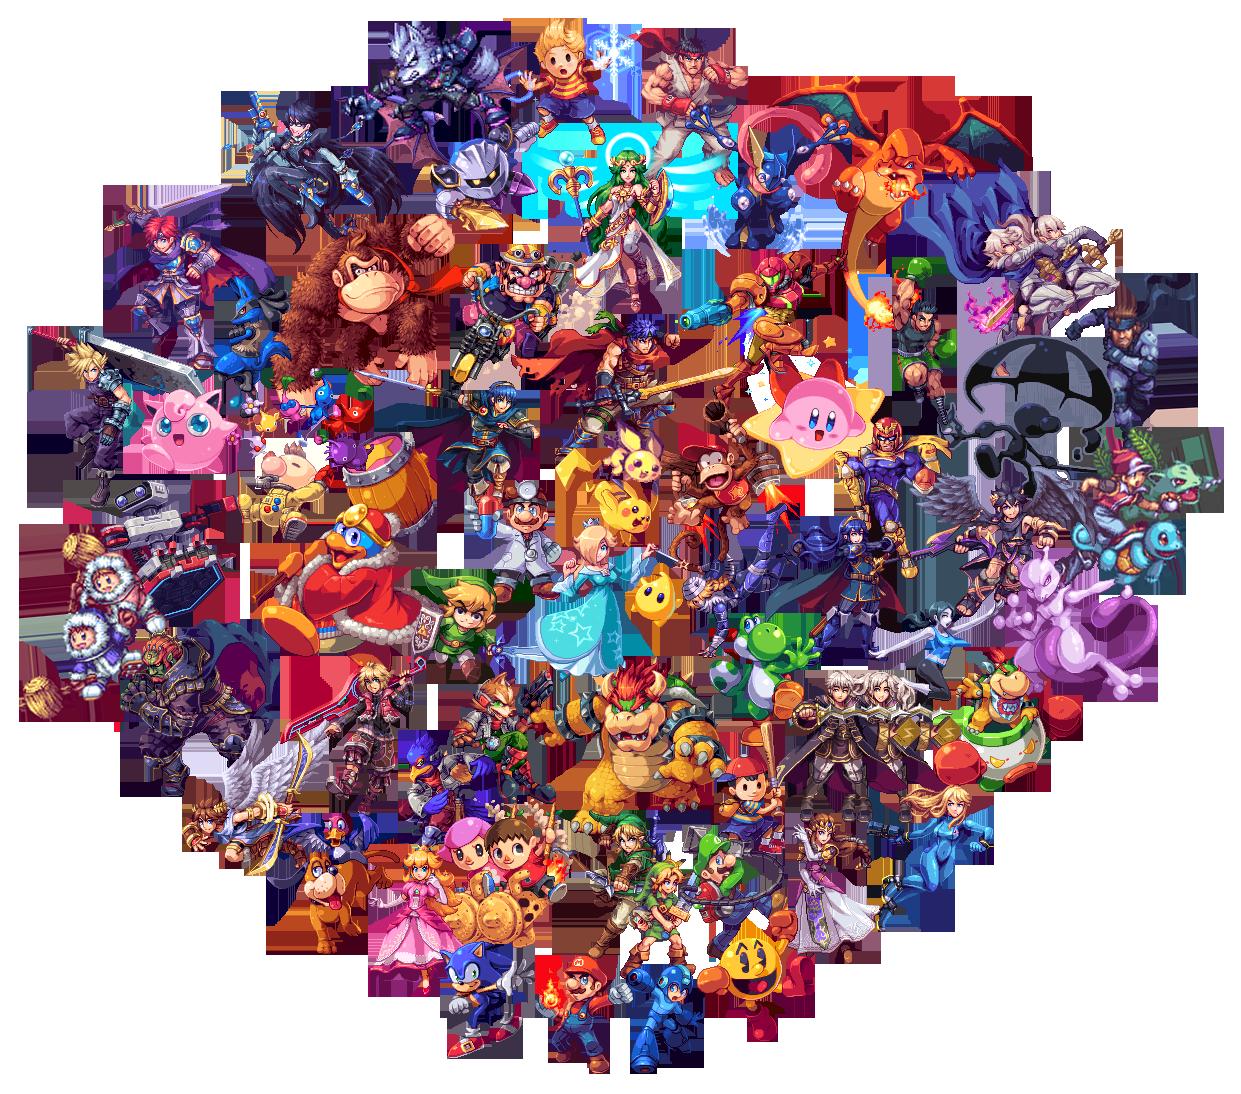 AbyssWolf's Smash 4 Pixel Art (+ Veterans) by Leafpenguins